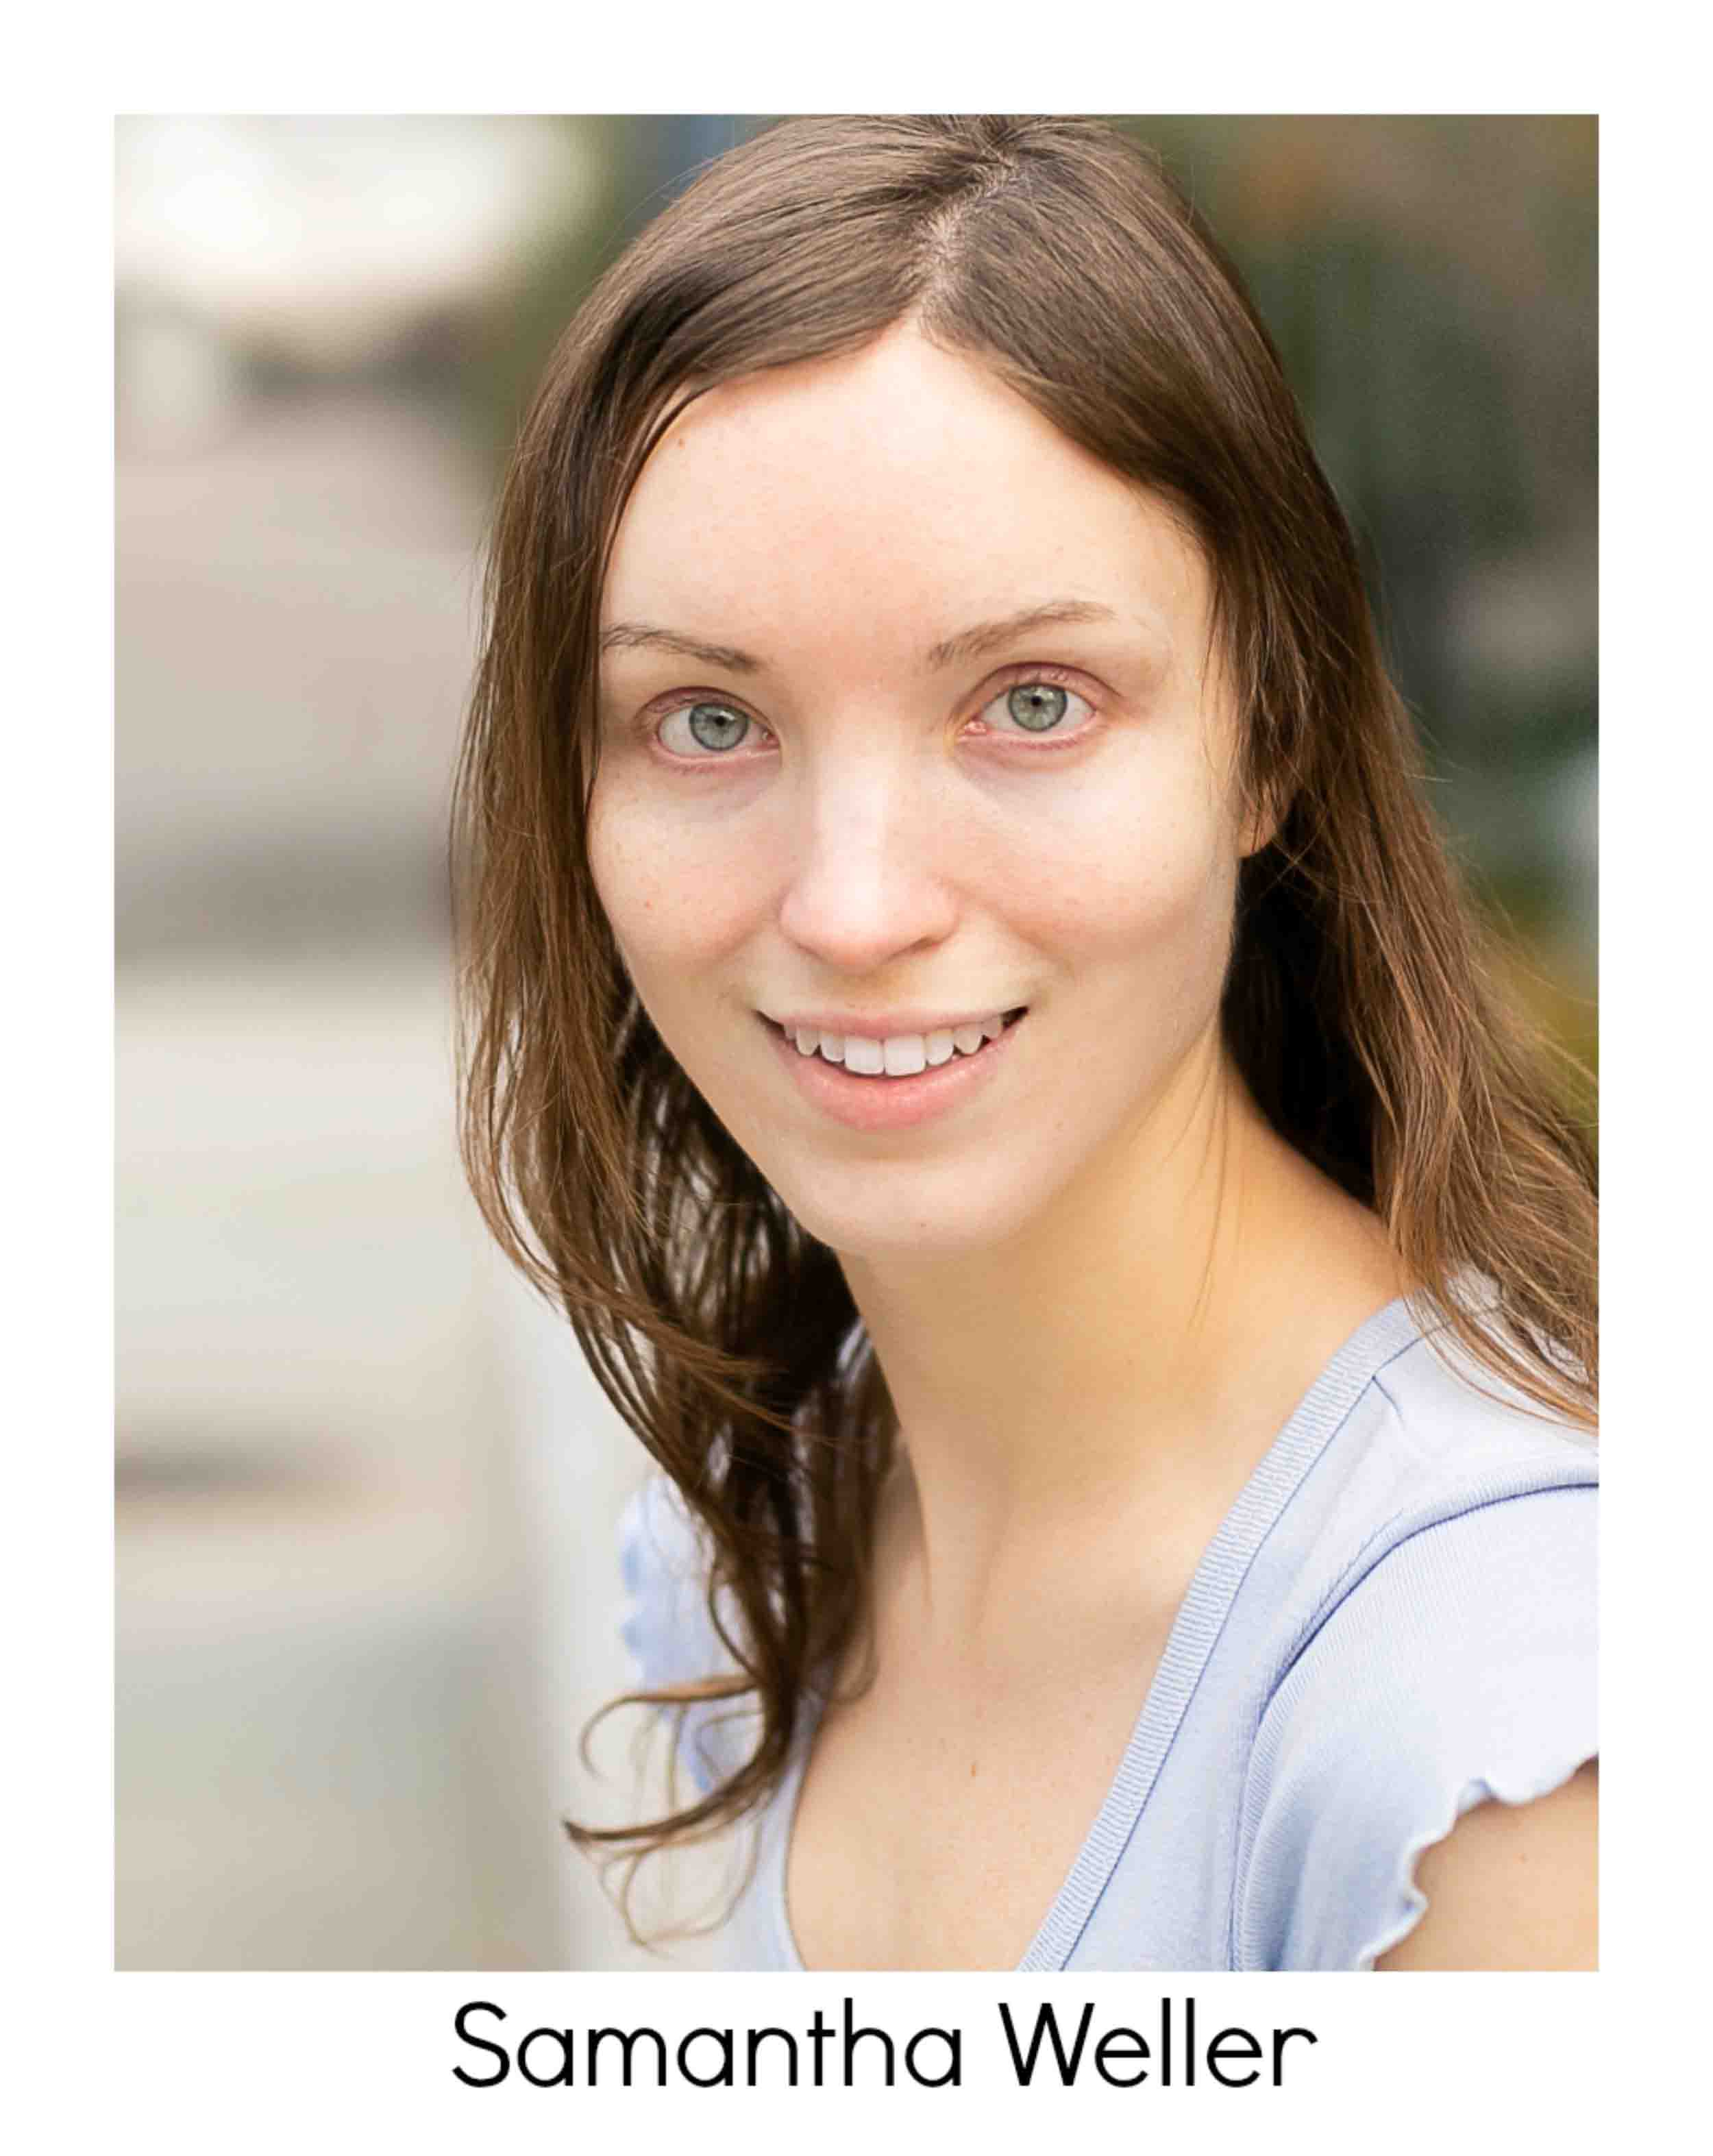 Samantha Weller_Headshot2.jpg